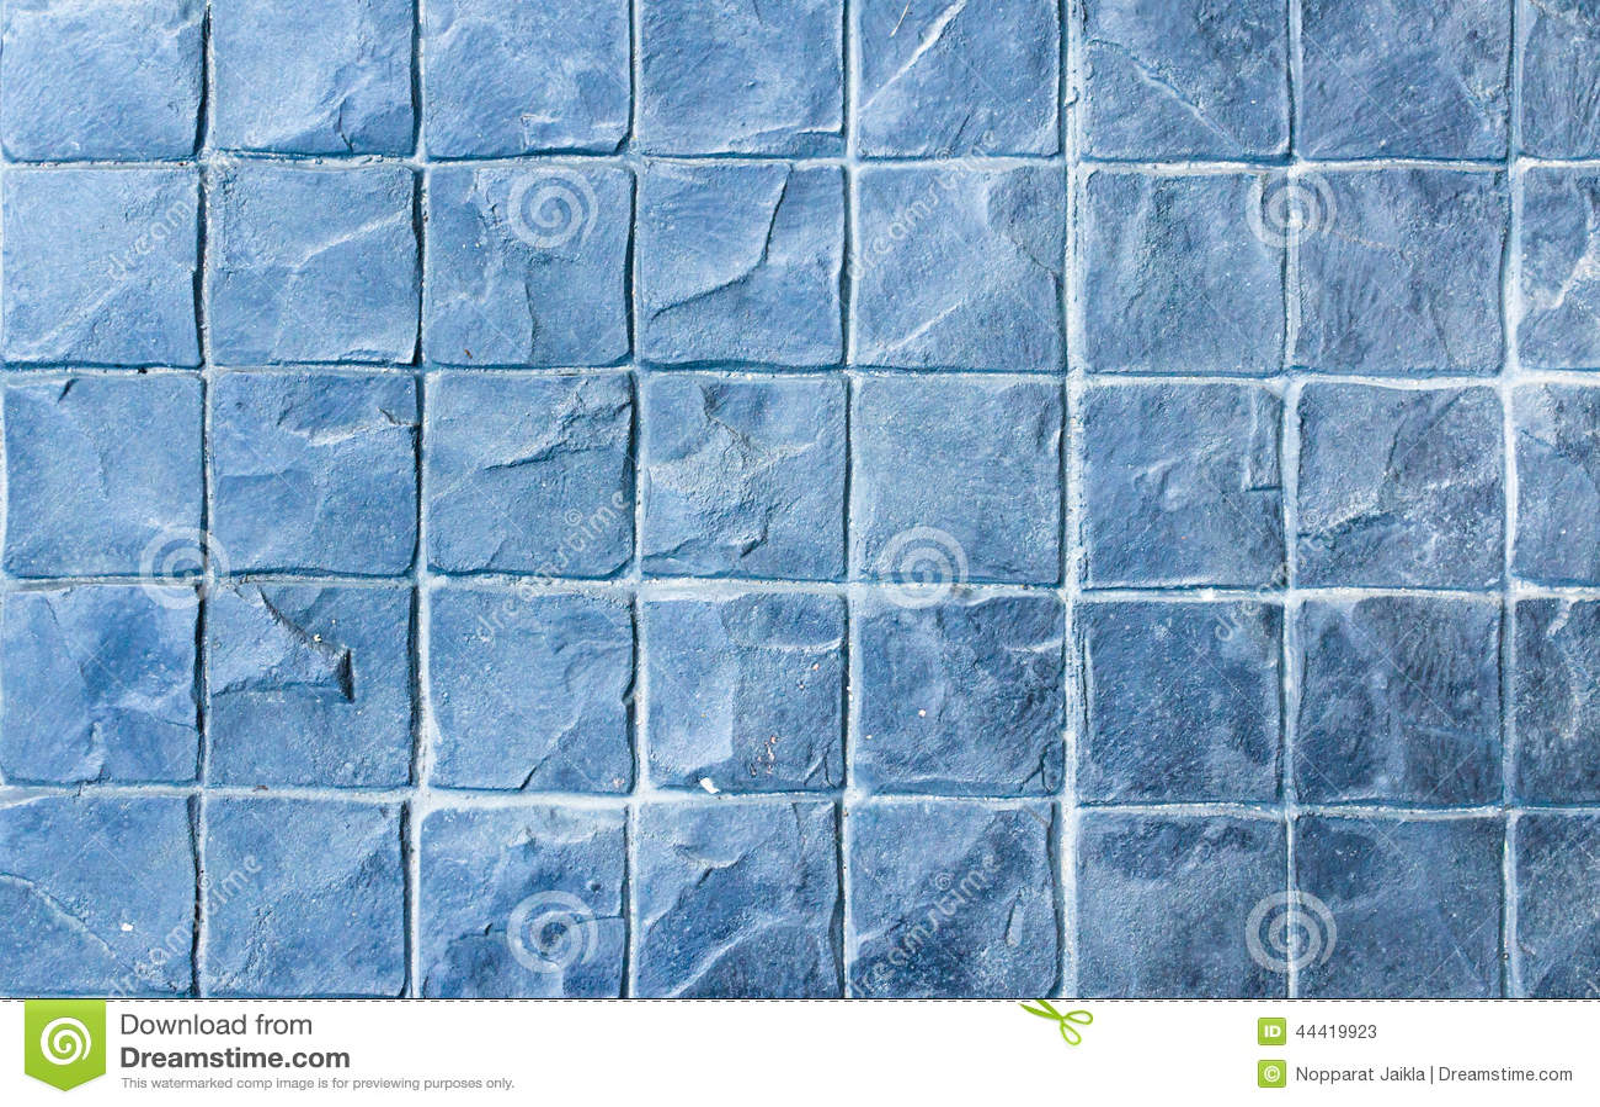 kitchen vinyl floor tiles aid cooktop 提名难倒现代厨房的纹理乙烯基一个普遍的选择库存图片 图片包括有塑料 提名难倒现代厨房和卫生间的纹理乙烯基一个普遍的选择